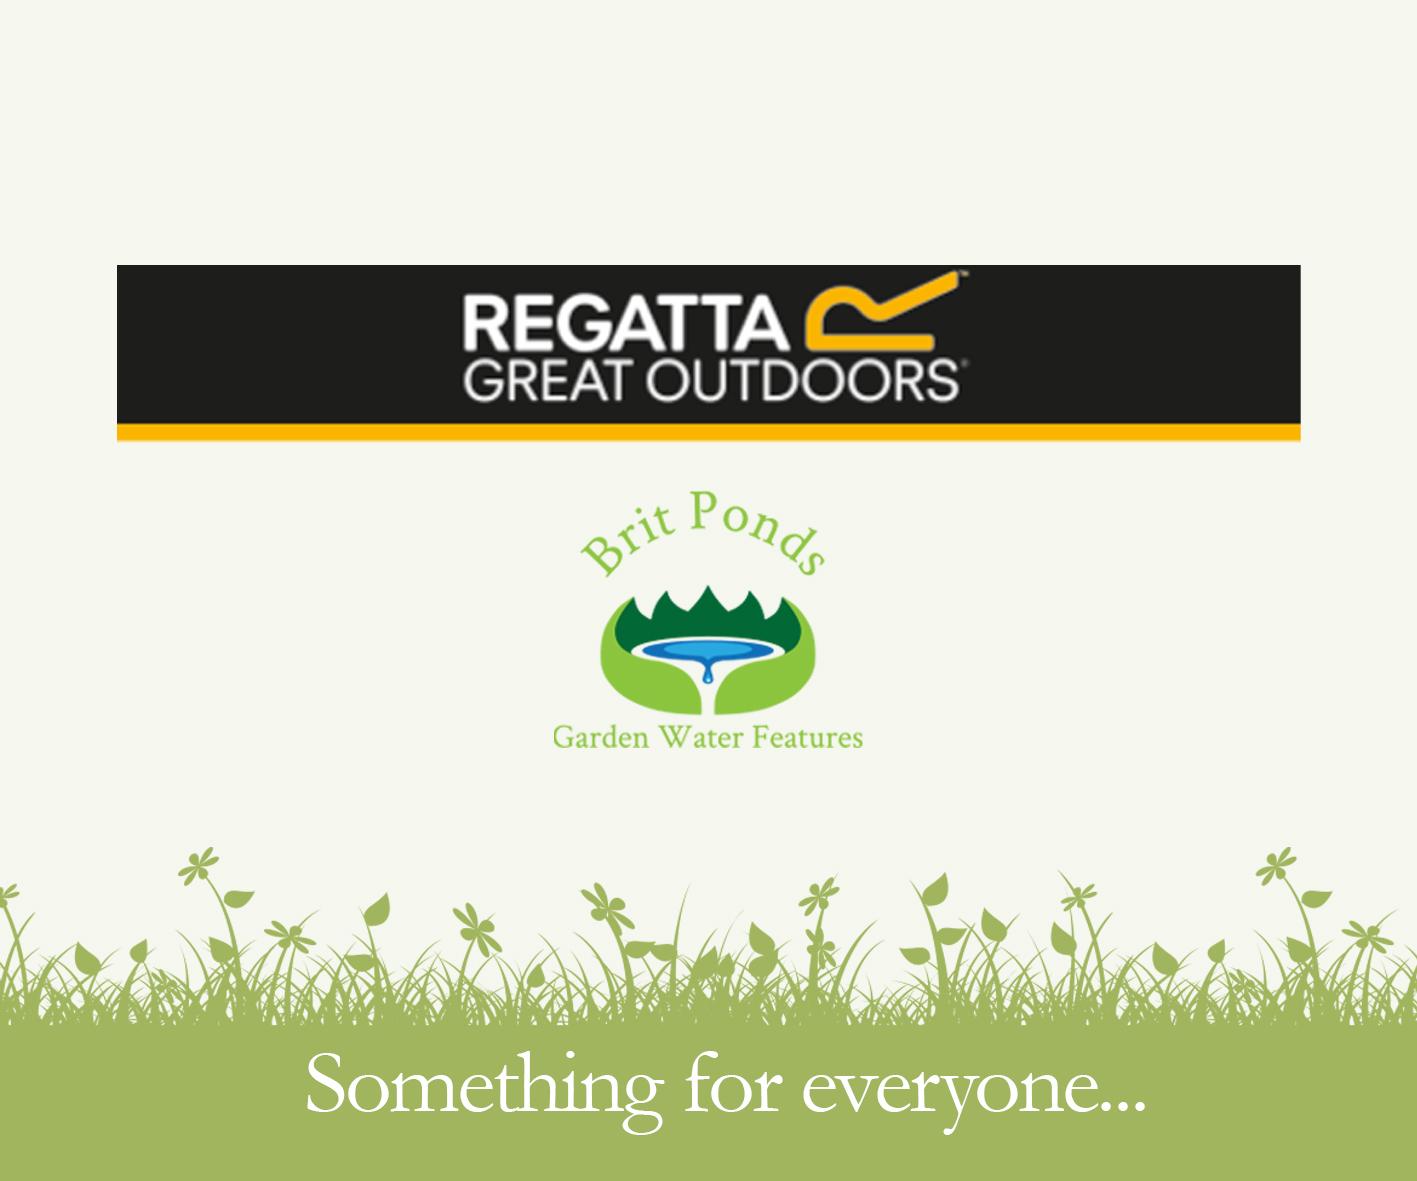 Hemel Garden Centre Regatta Clothing and Brit Ponds